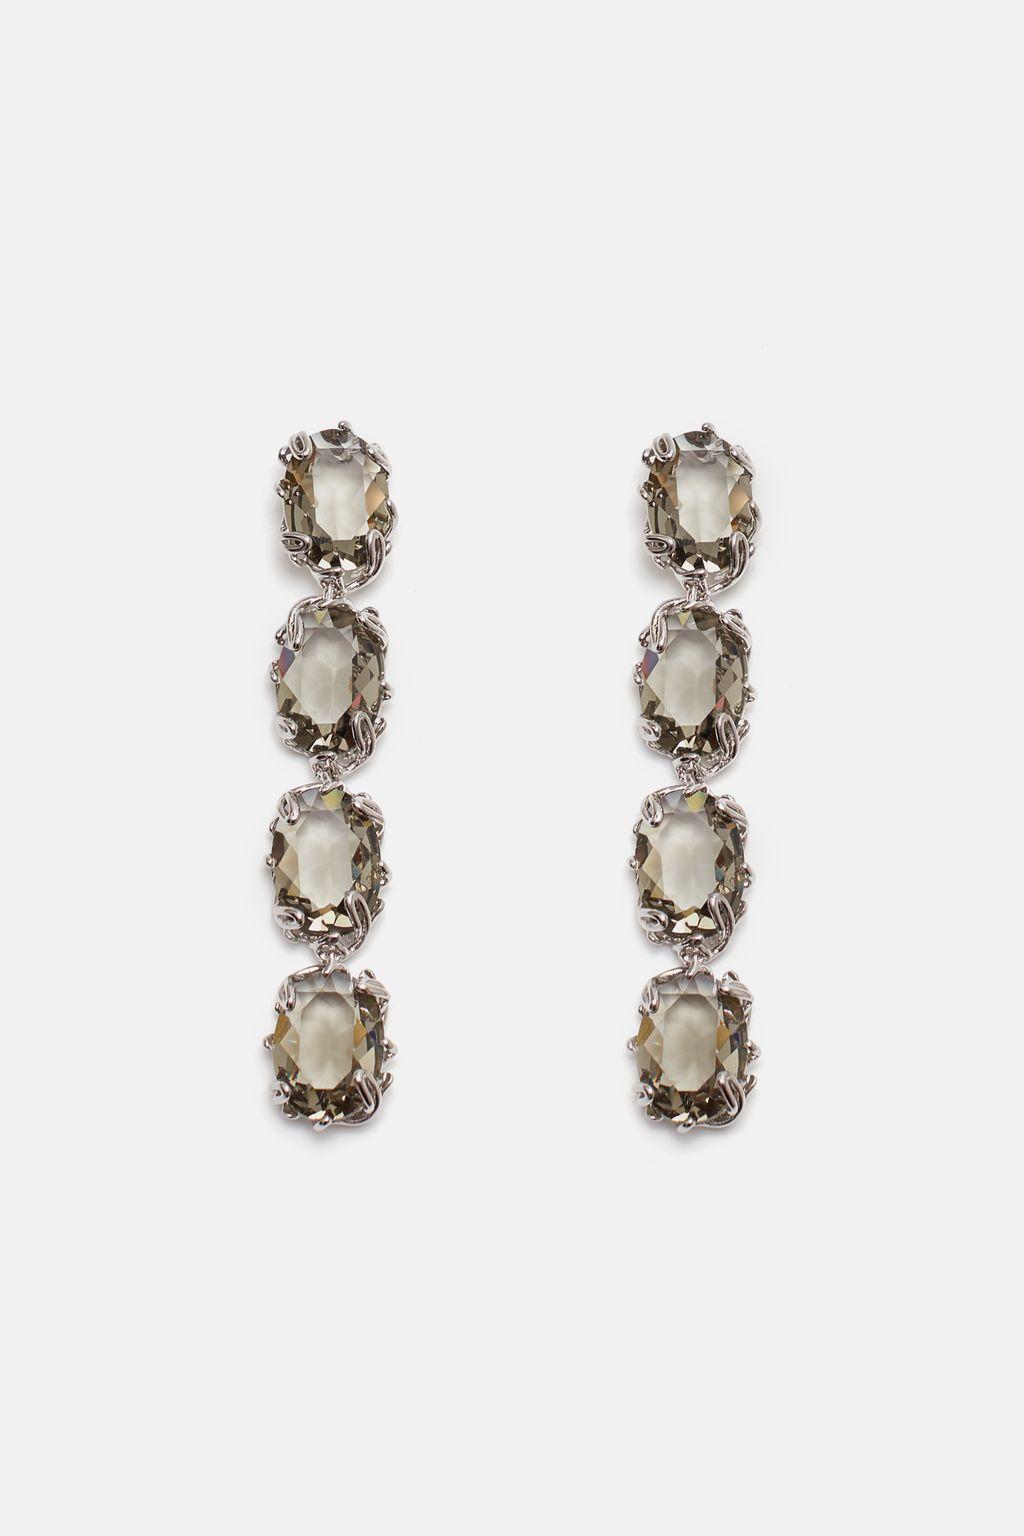 Cocktail drop earrings